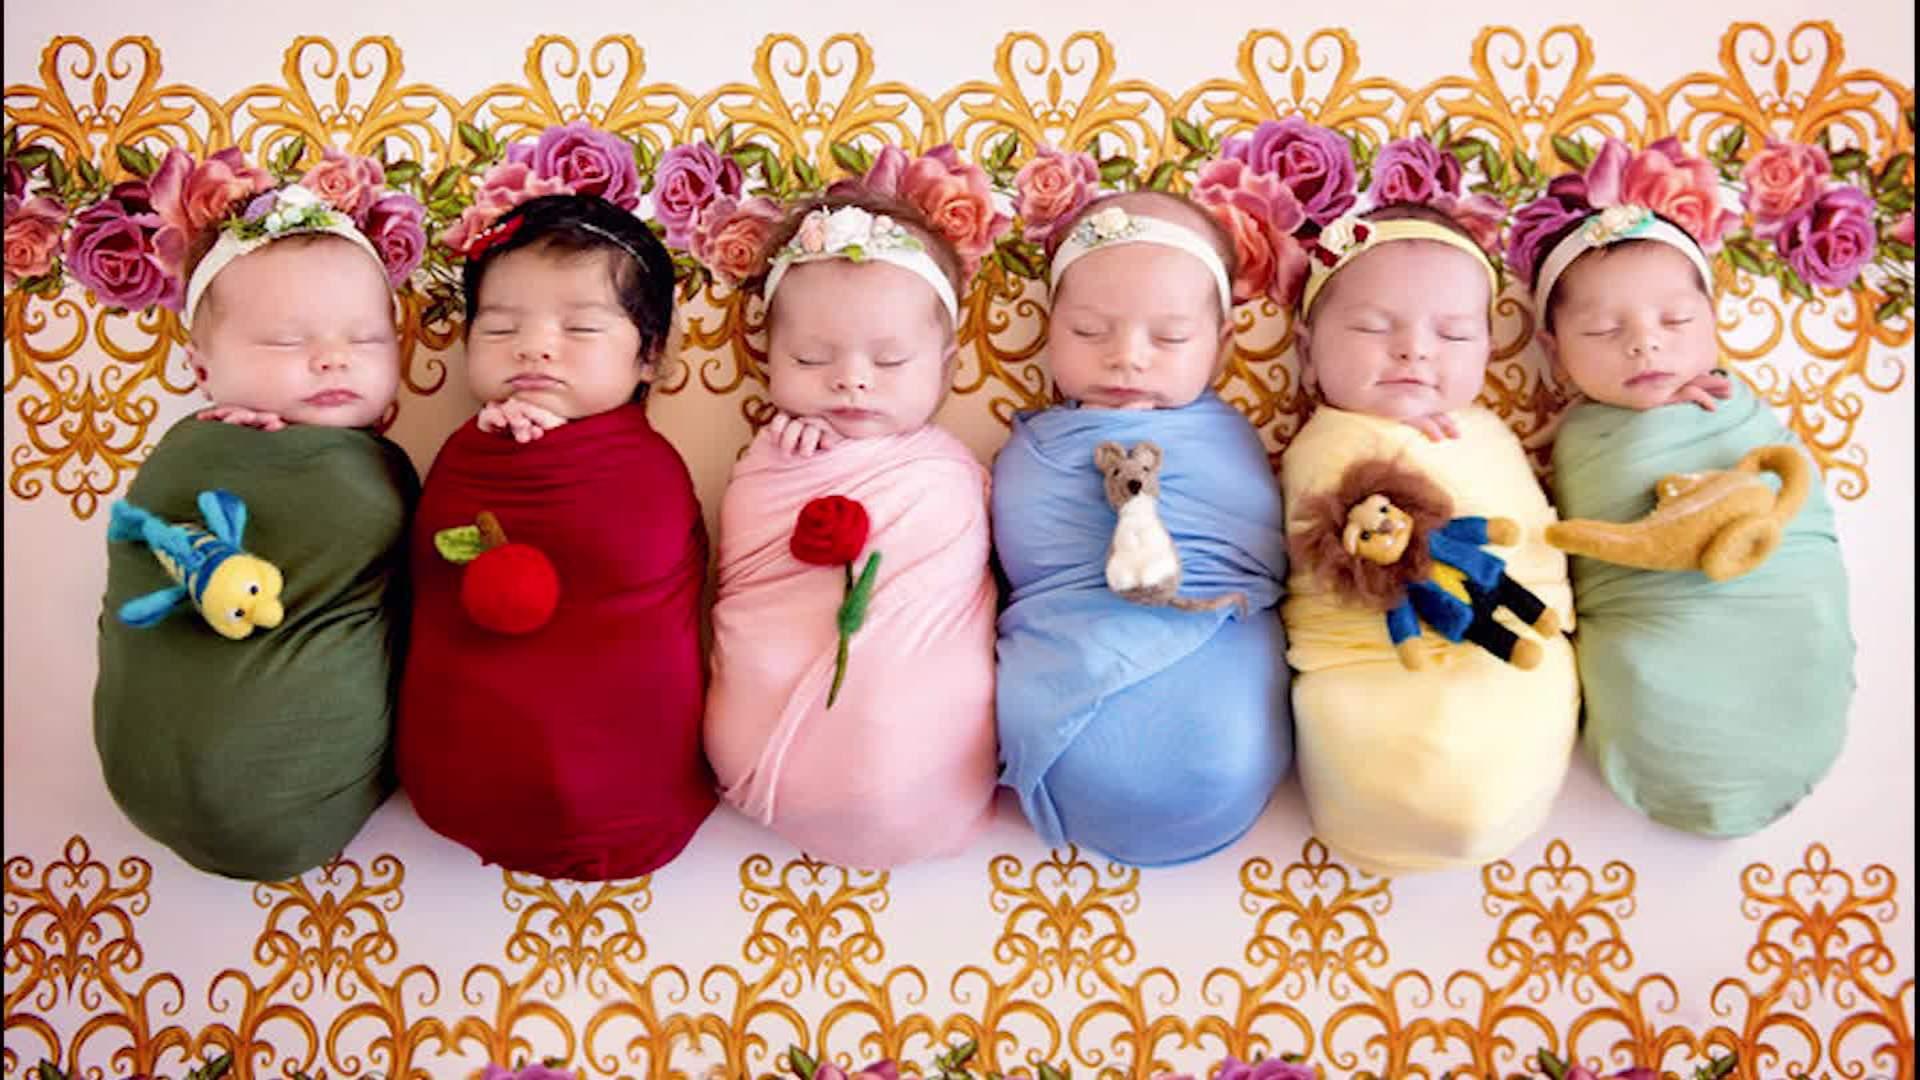 tiny babies transformed to disney princesses - cnn video